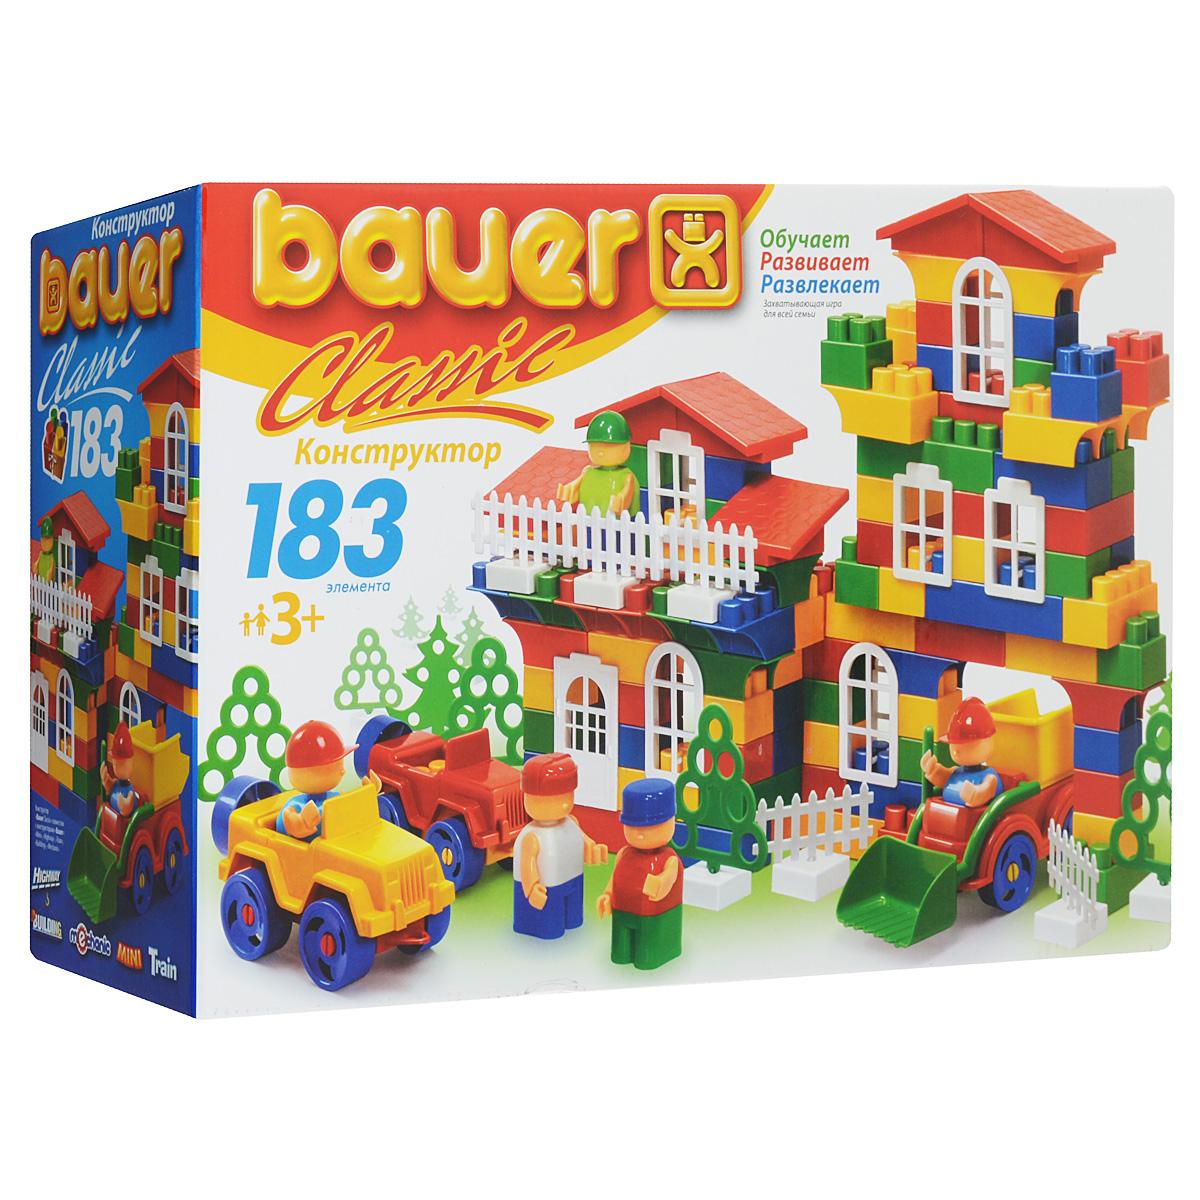 Bauer Конструктор Classic 198 lego classic конструктор дополнение к набору для творчества яркие цвета 10693